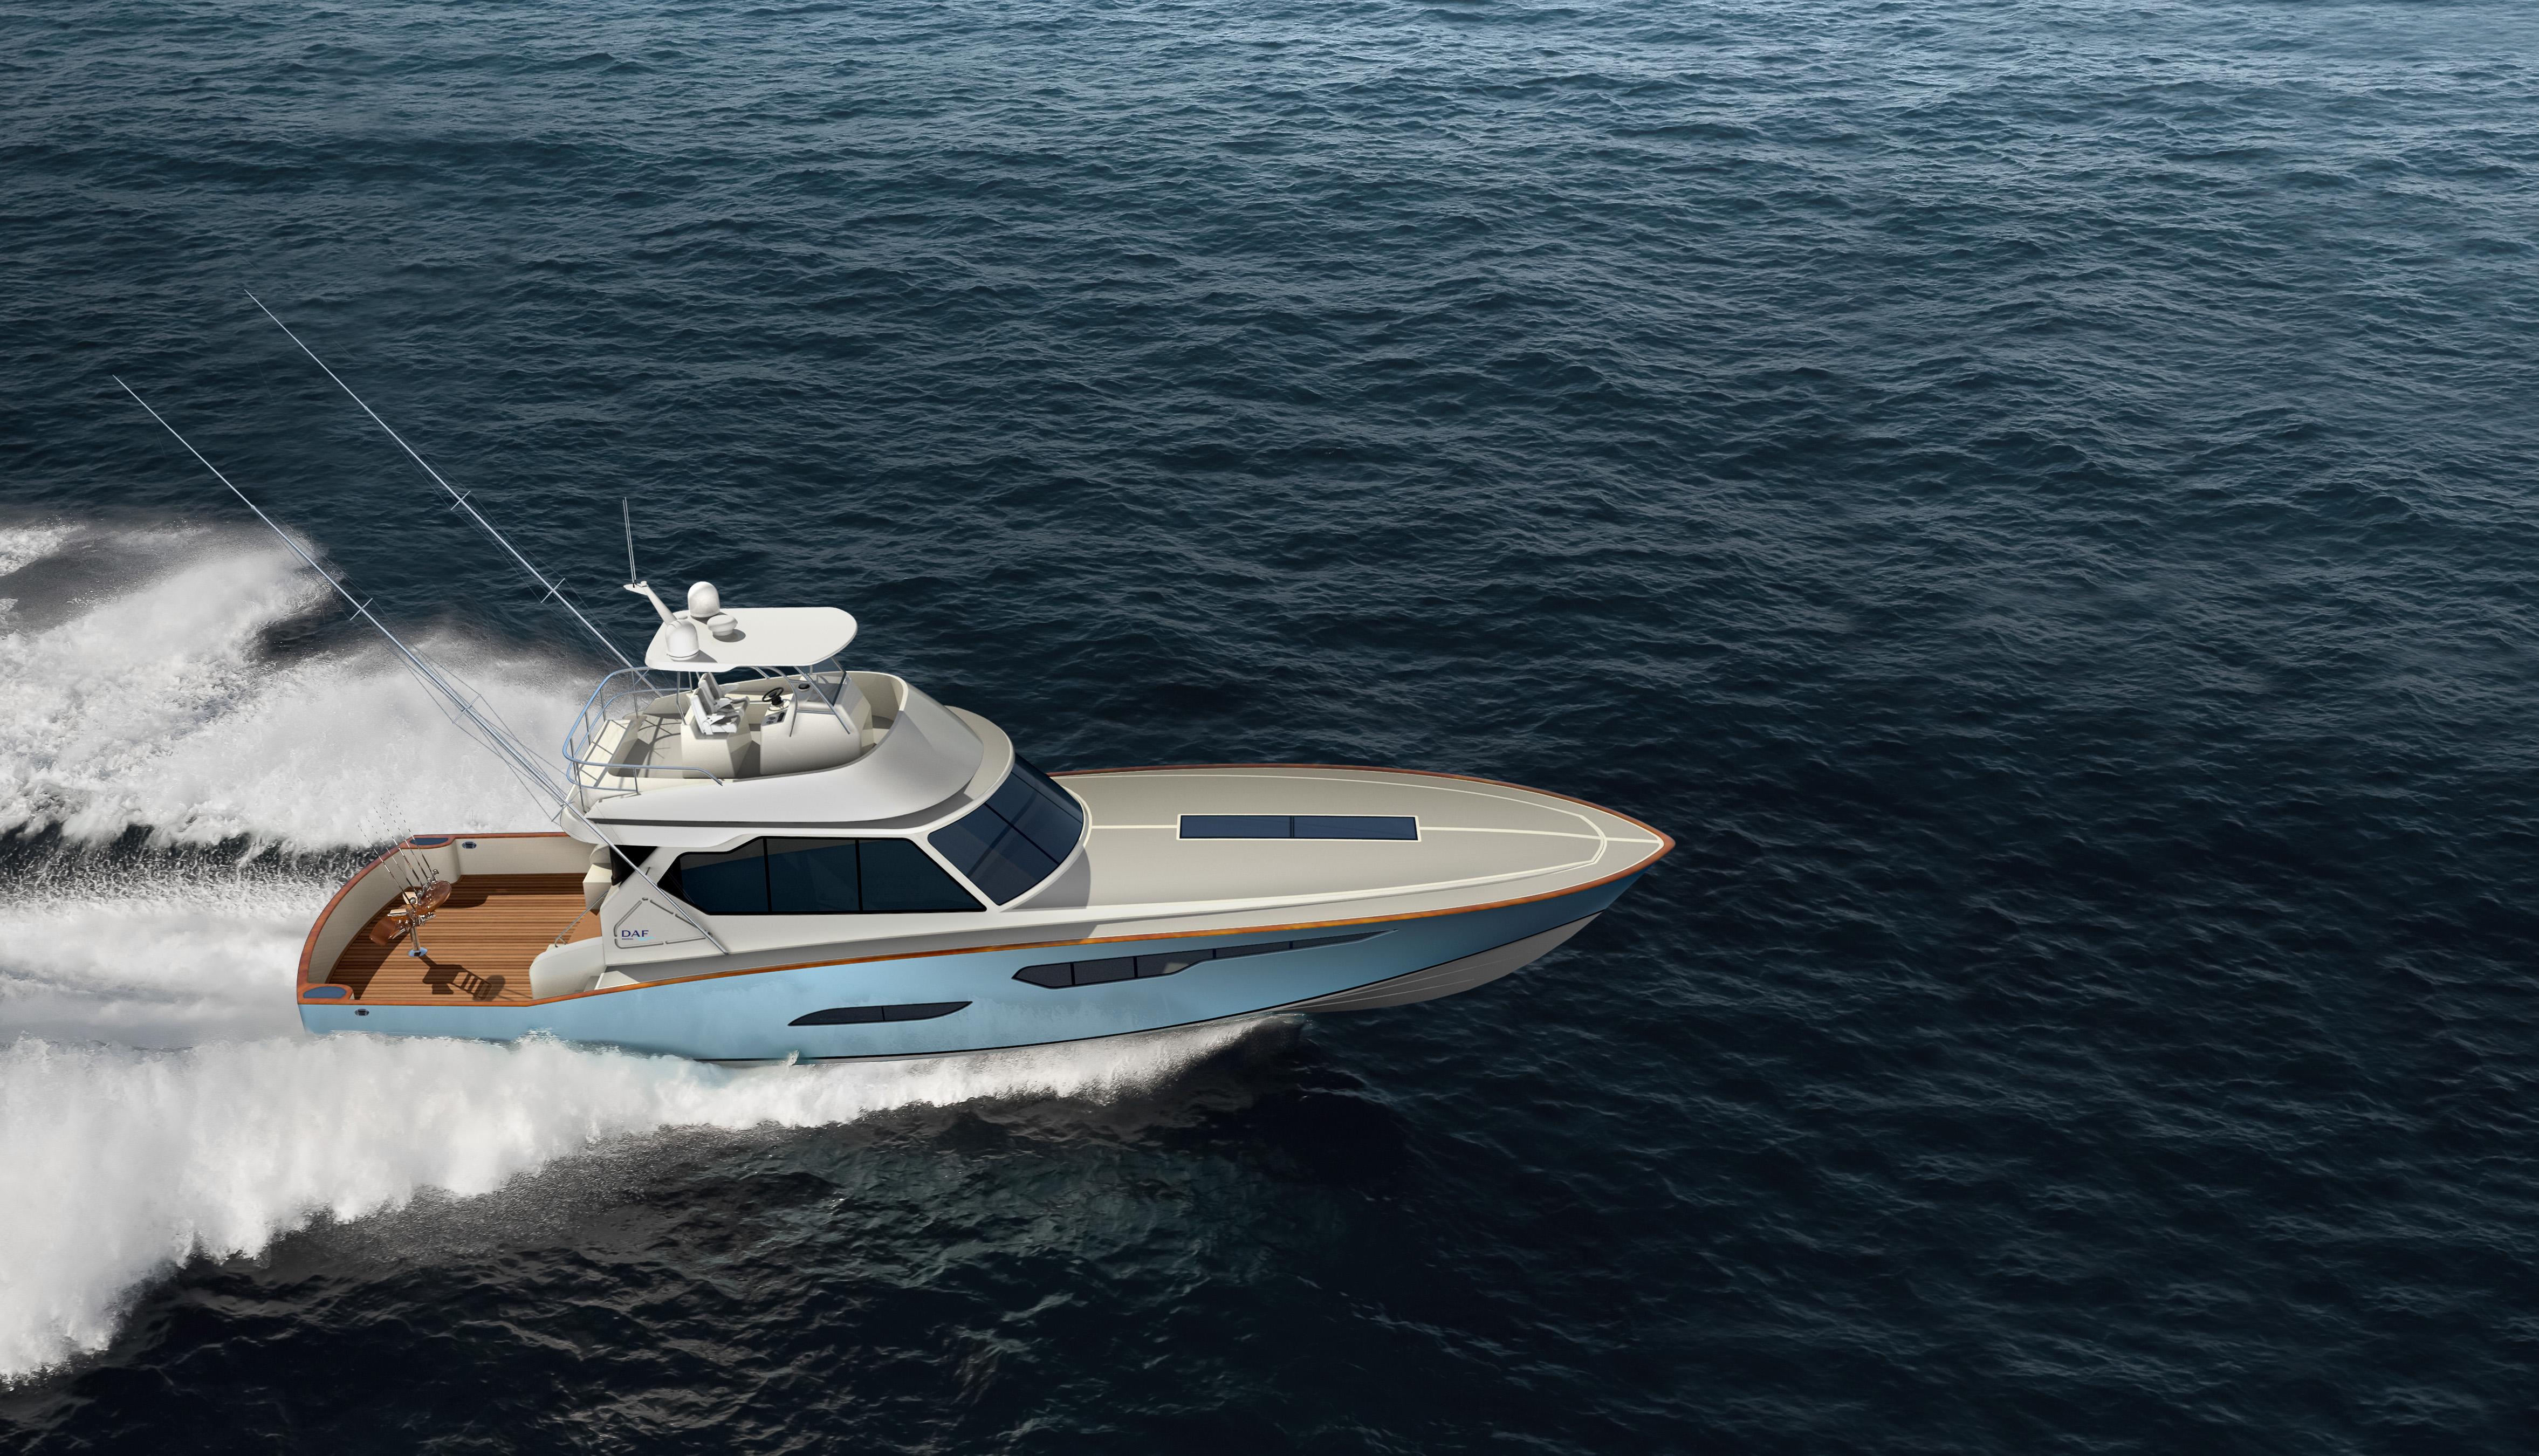 DAF-73ft-Sportfishing-boat-2